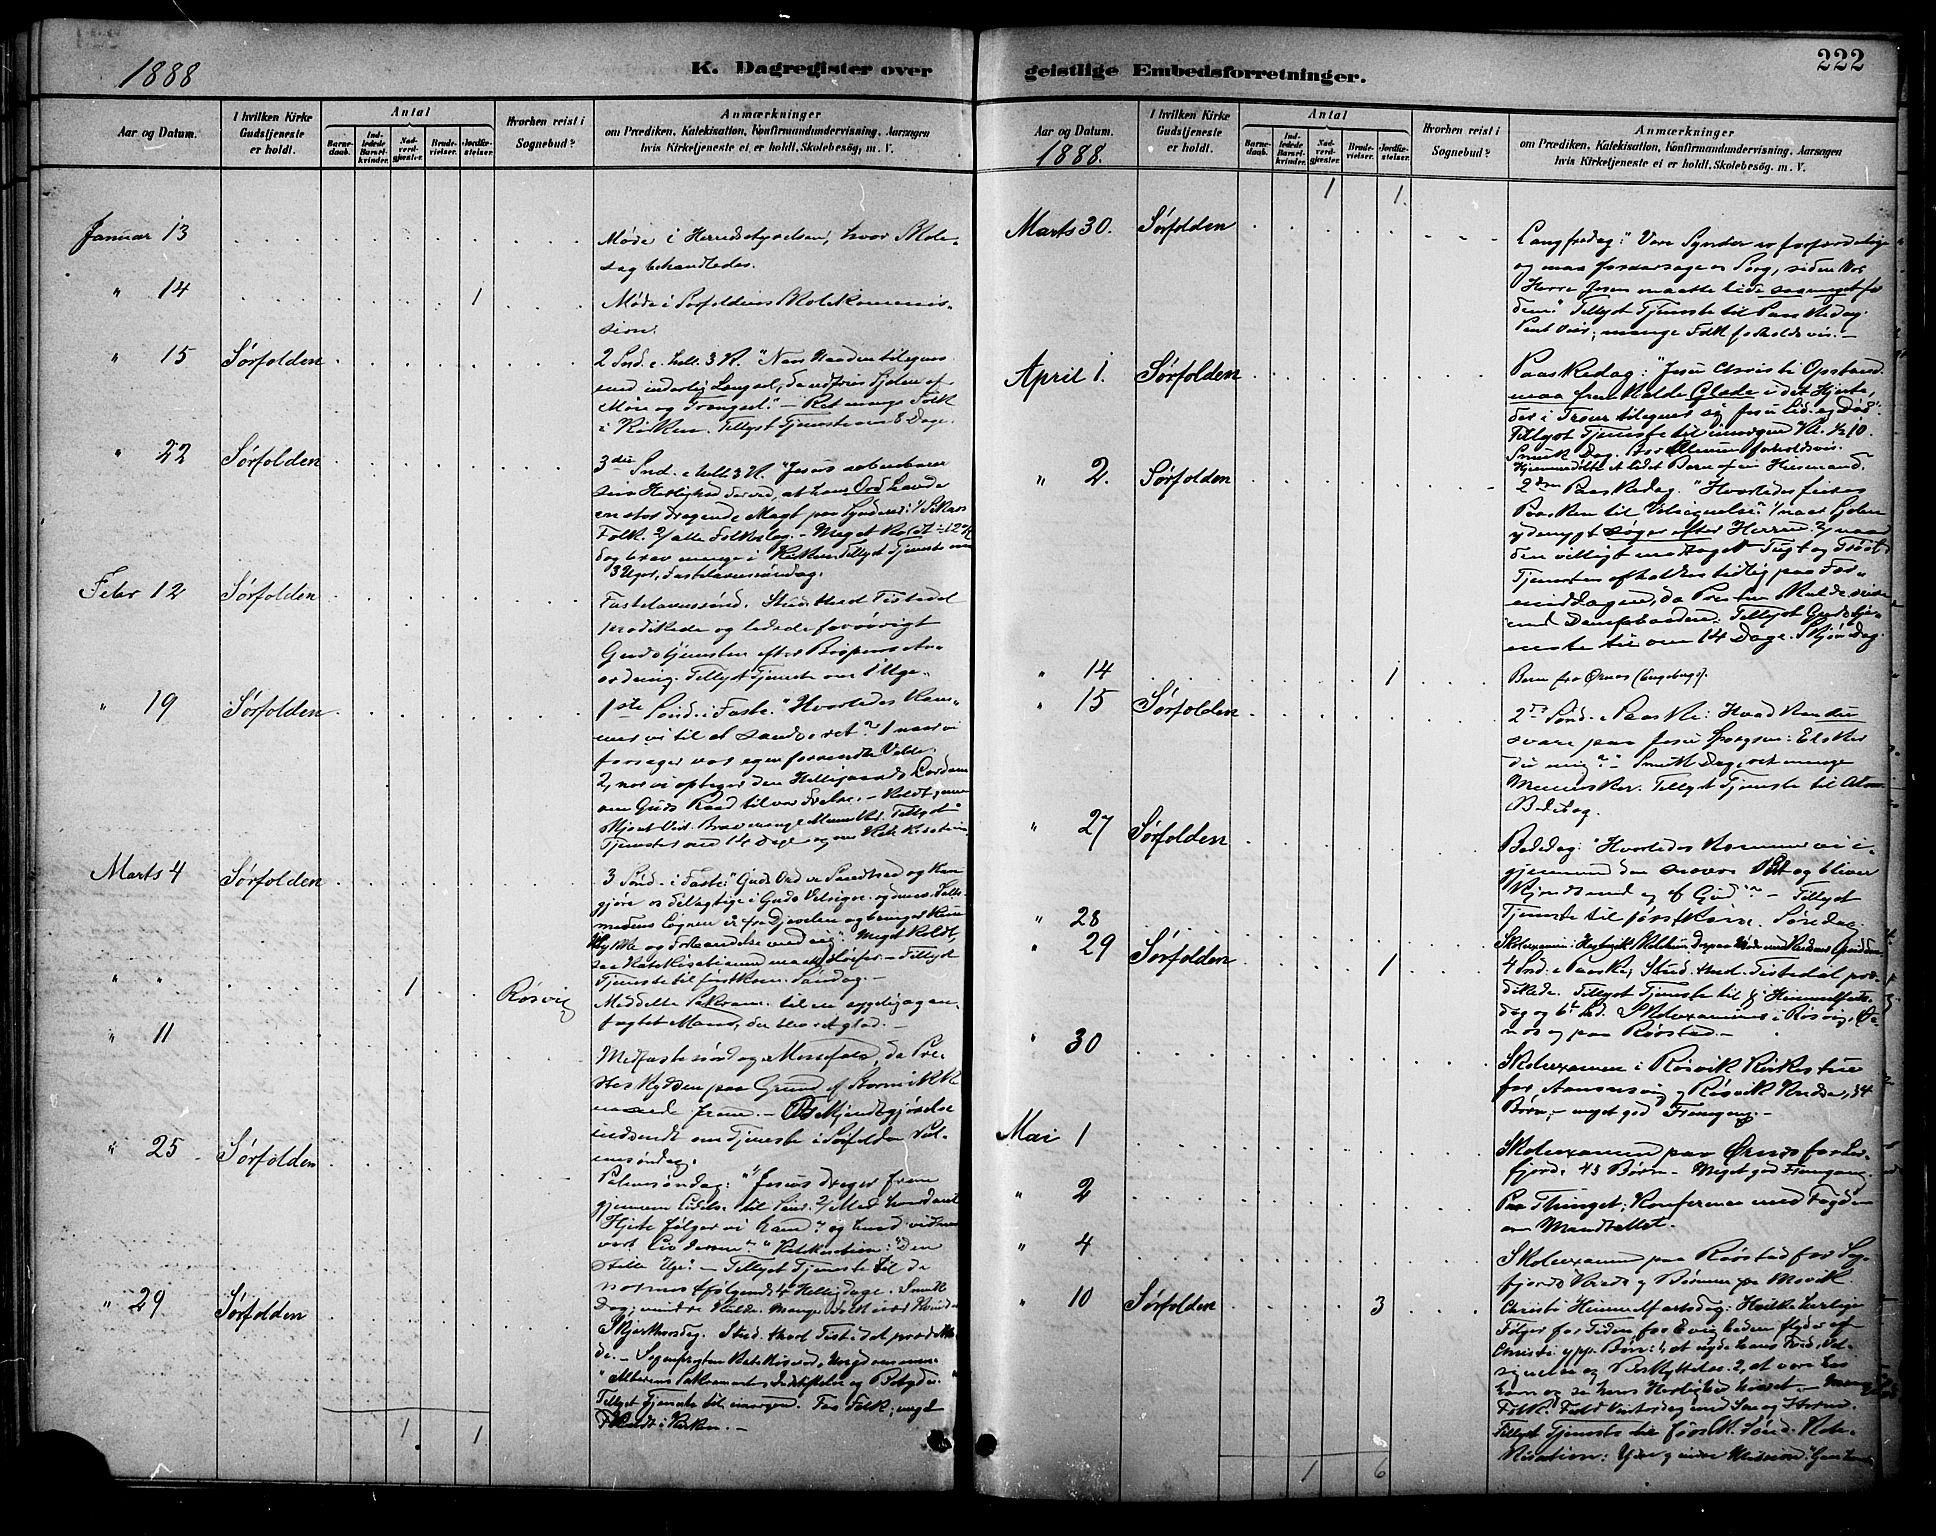 SAT, Ministerialprotokoller, klokkerbøker og fødselsregistre - Nordland, 854/L0777: Ministerialbok nr. 854A01 /1, 1883-1891, s. 222